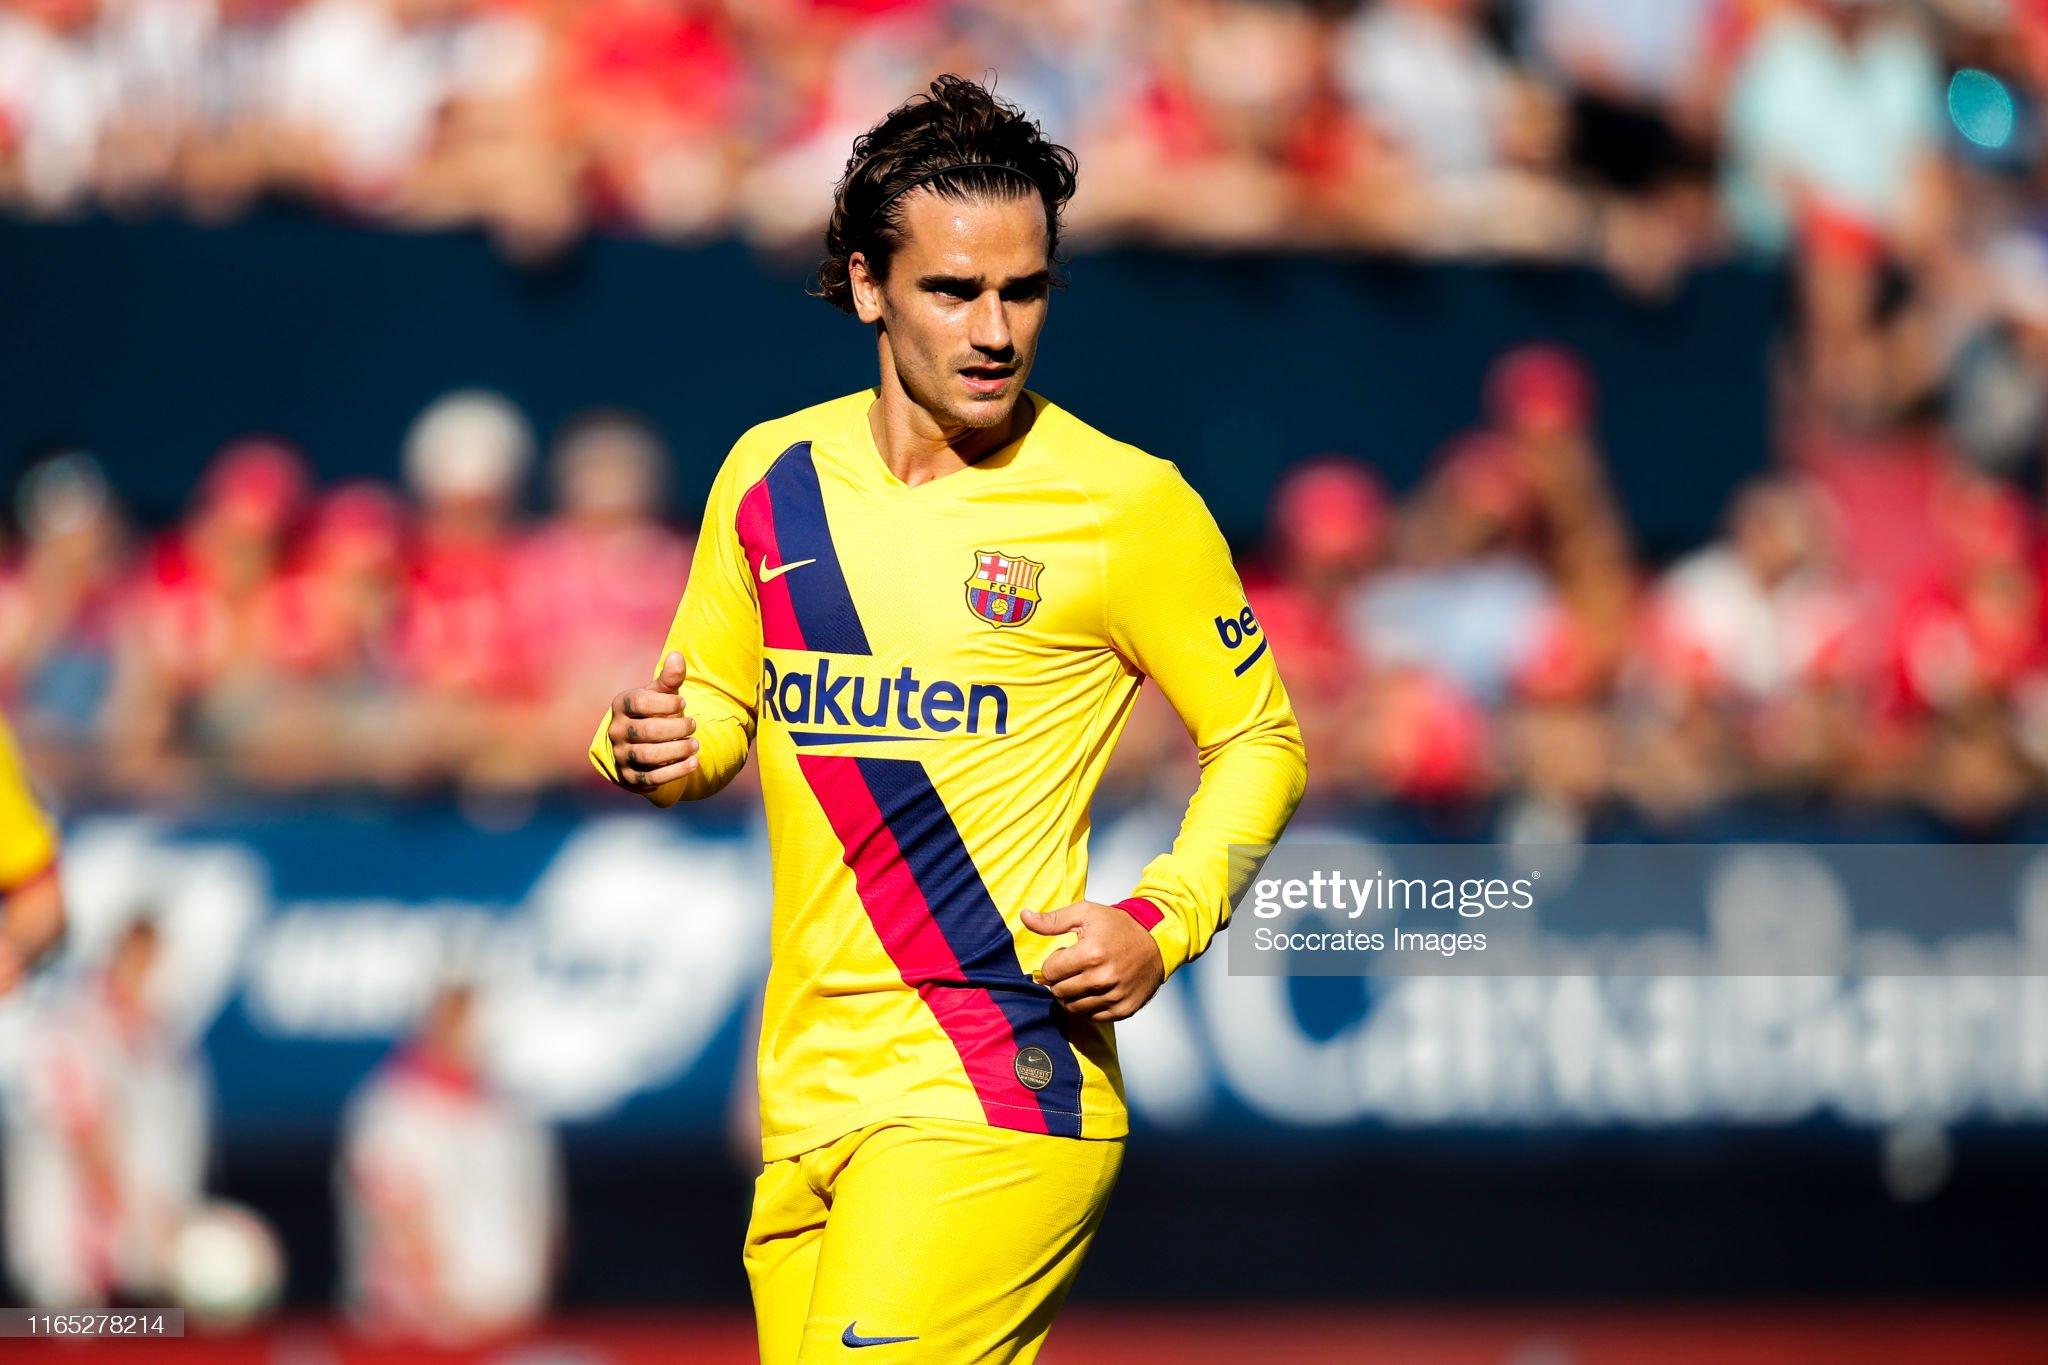 صور مباراة : أوساسونا - برشلونة 2-2 ( 31-08-2019 )  Antoine-griezmann-of-fc-barcelona-during-the-la-liga-santander-match-picture-id1165278214?s=2048x2048